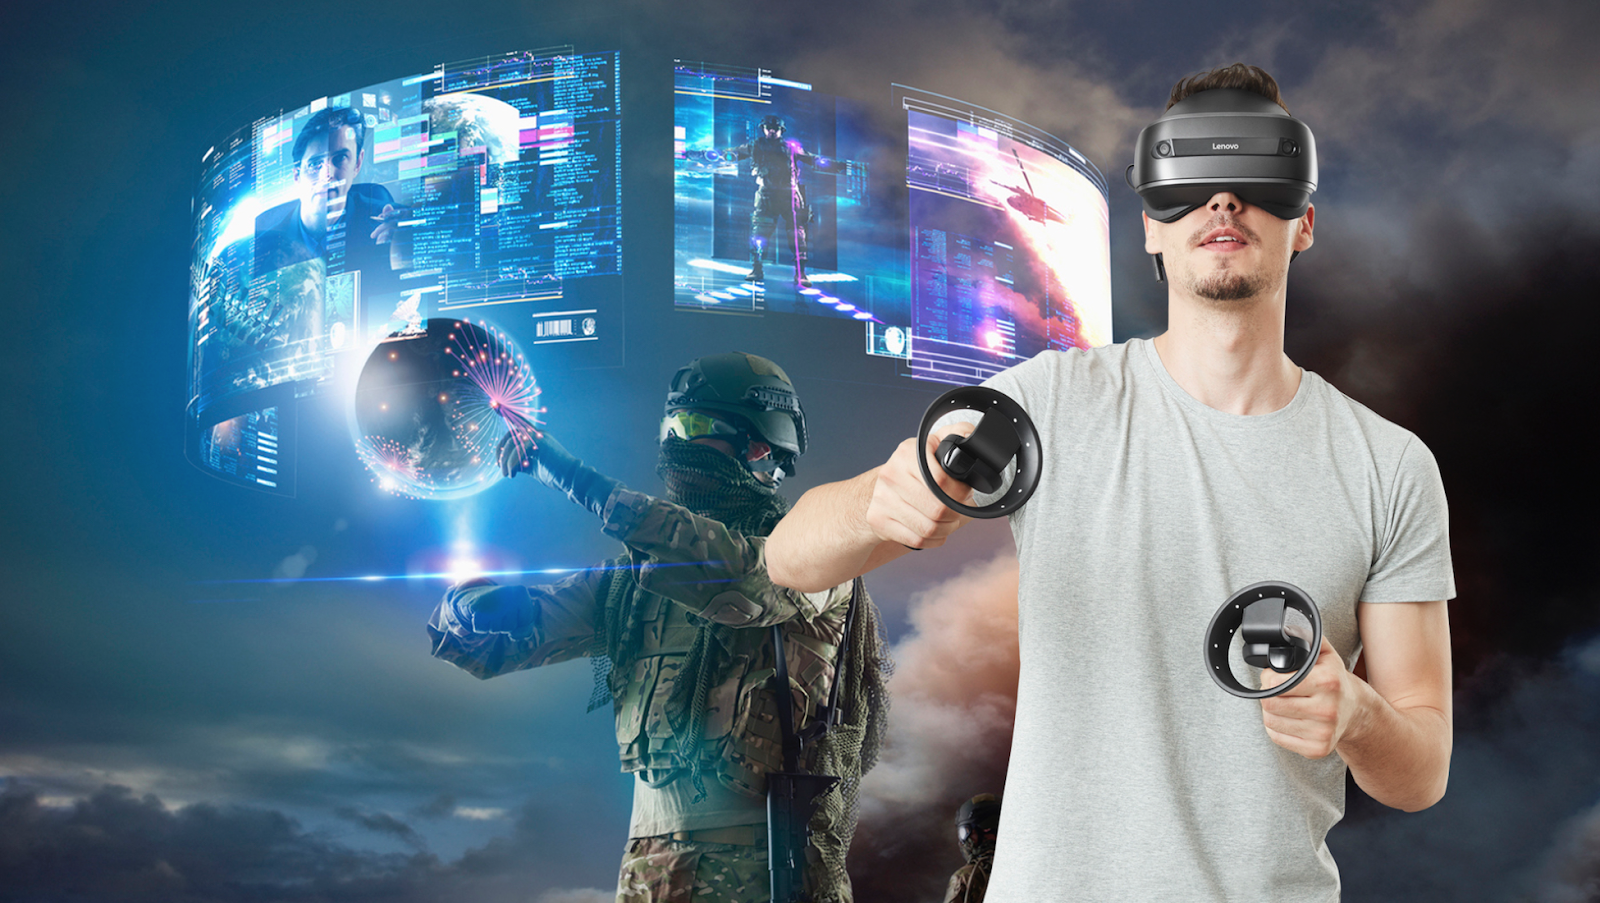 https://www.pvsm.ru/images/2017/10/04/virtualnaya-realnost-so-shlemom-Lenovo-Explorer.png